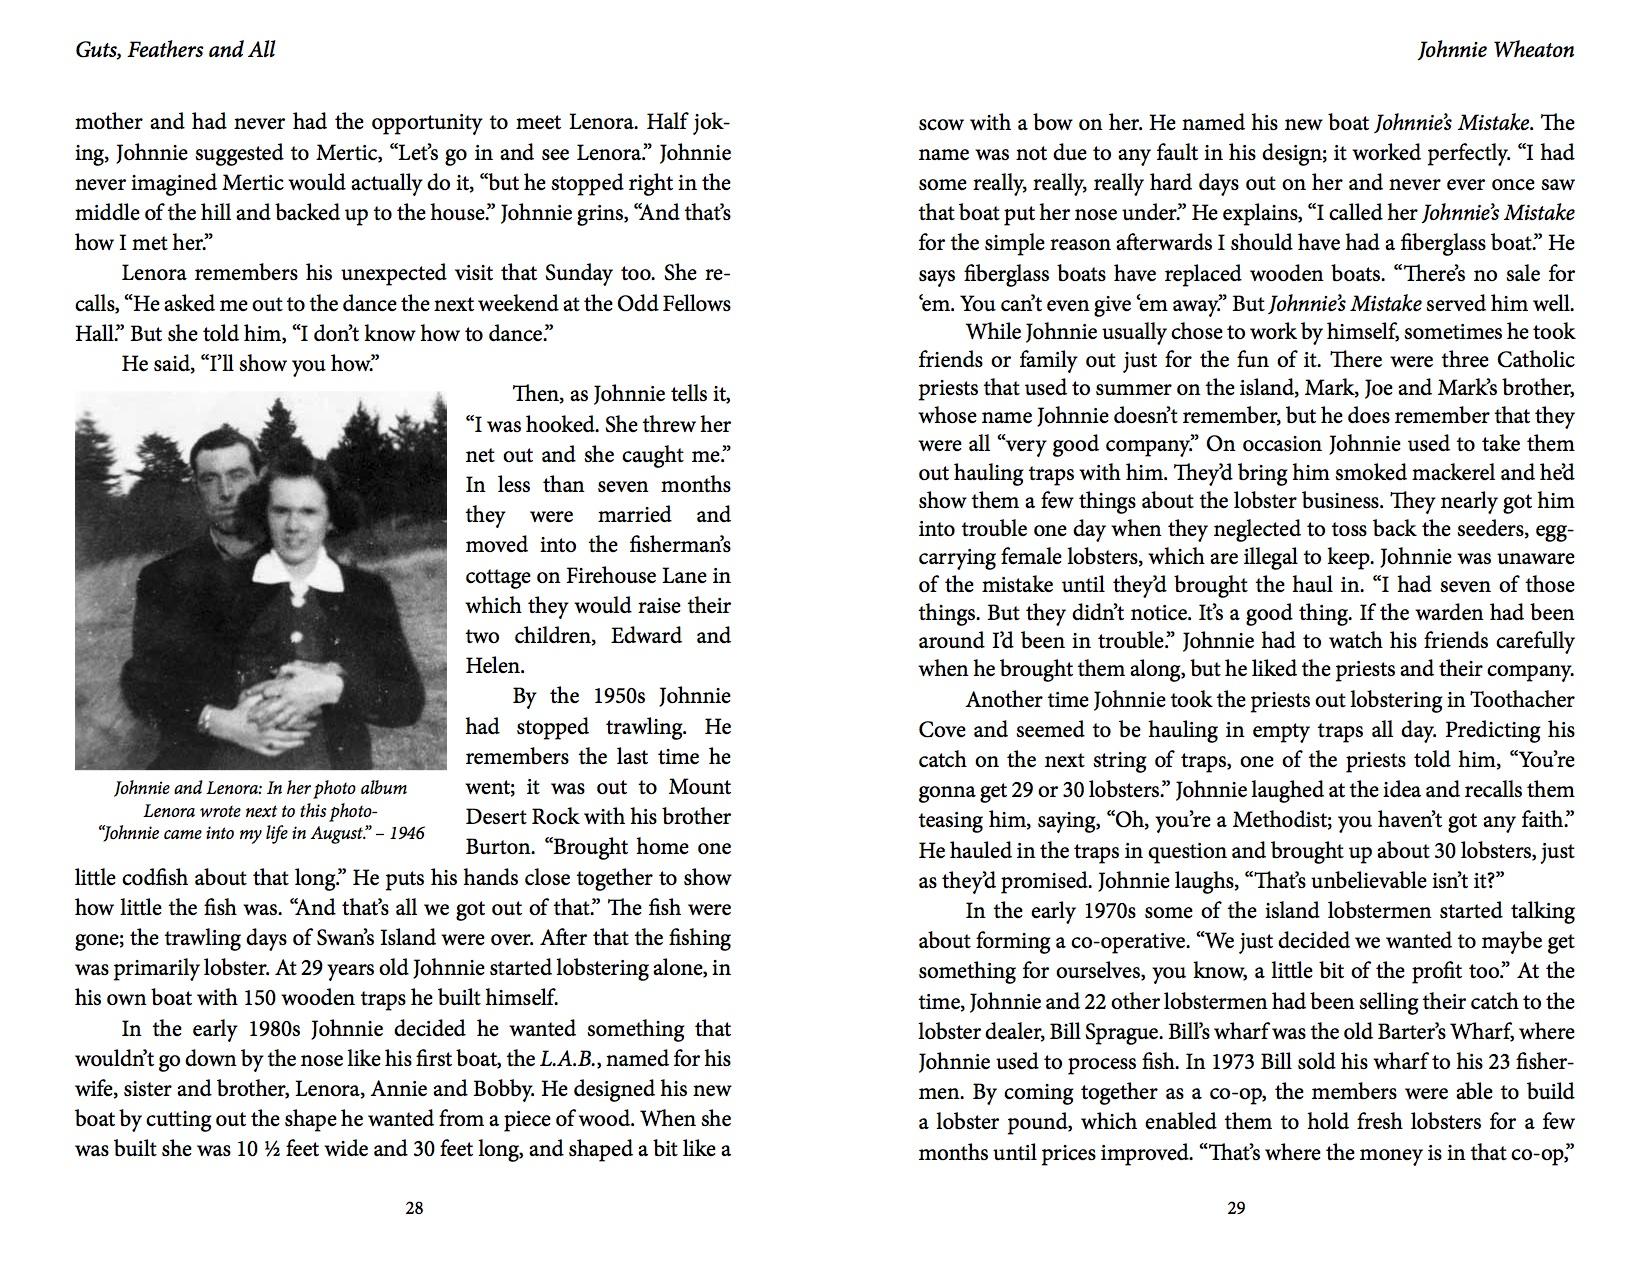 Johnnie W page 4.jpg